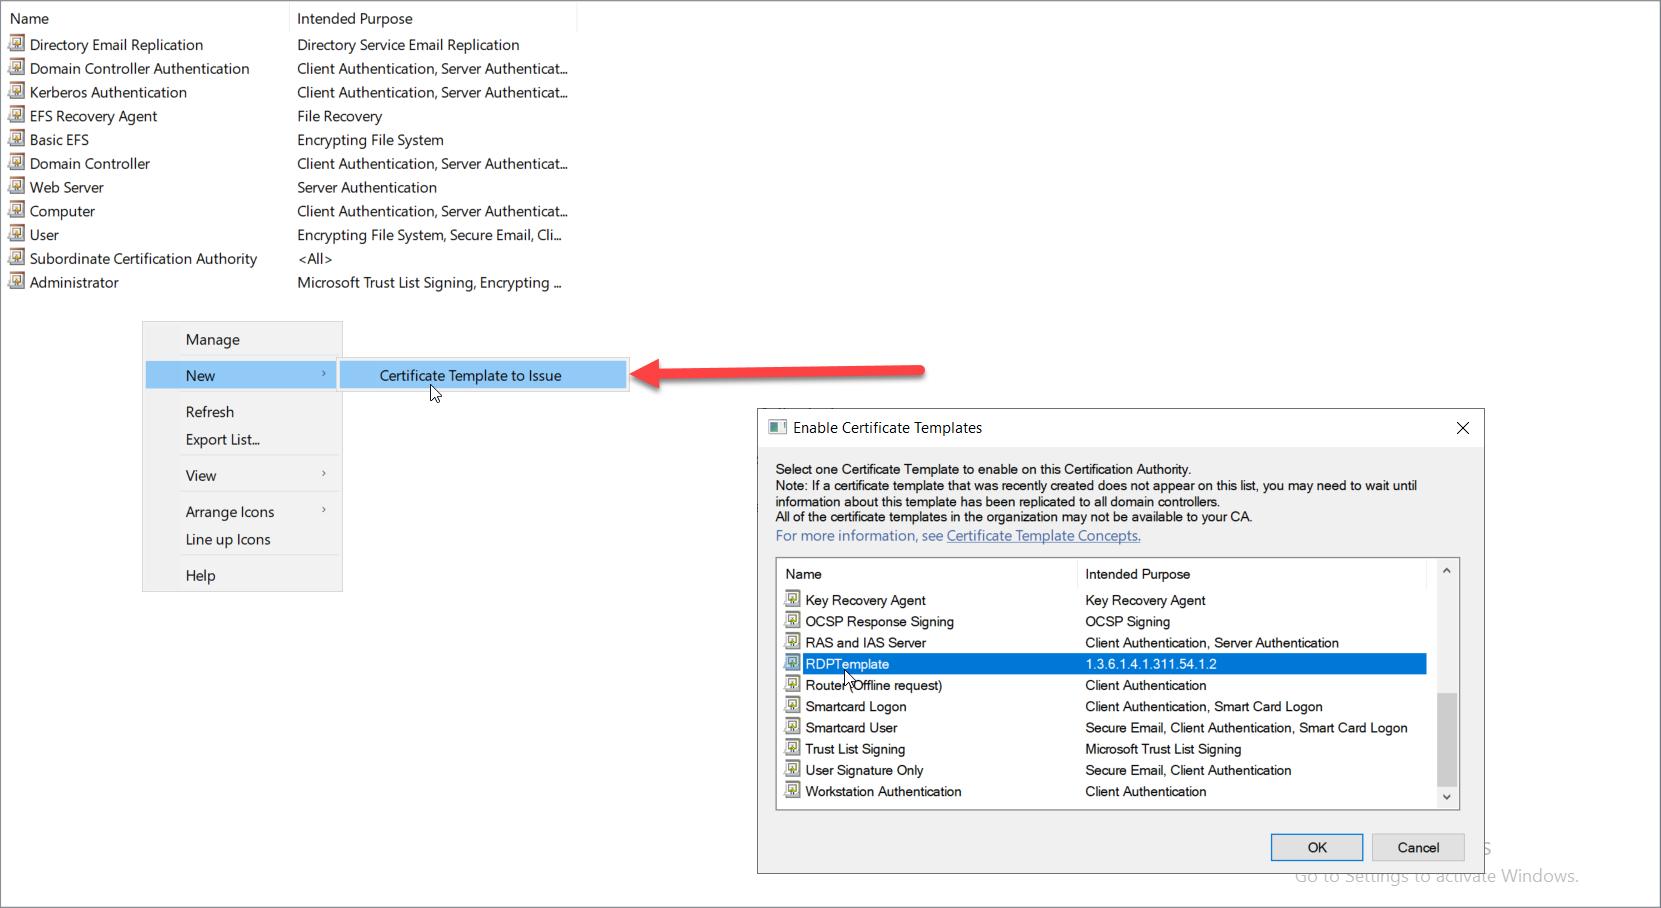 Настройка Tls Для Rdp Подключений | Блог Александра Ткаченко For Workstation Authentication Certificate Template